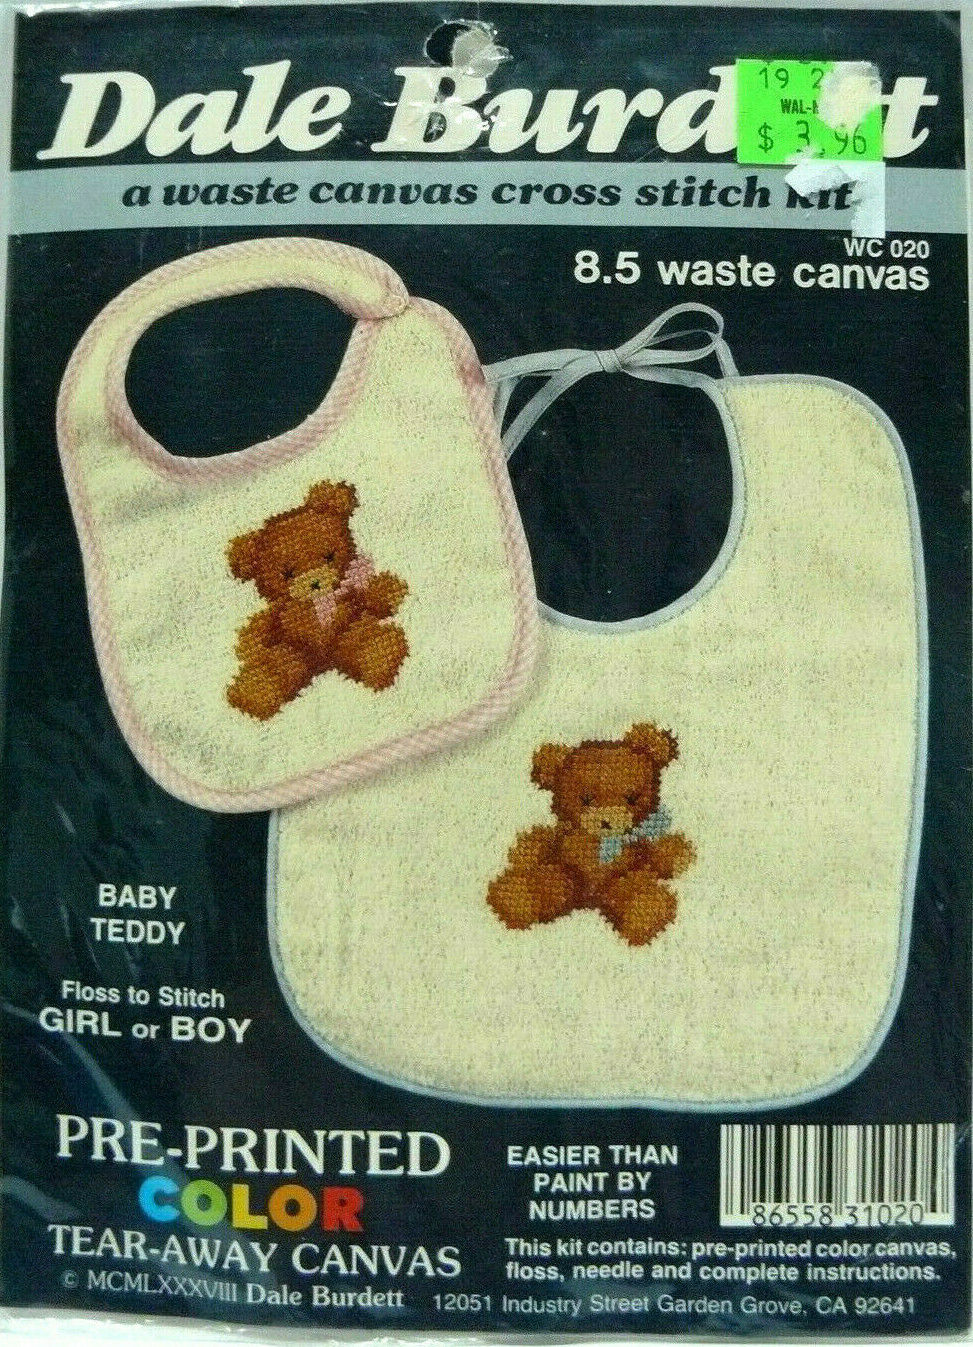 waste canvas cross stitch kit baby teddy